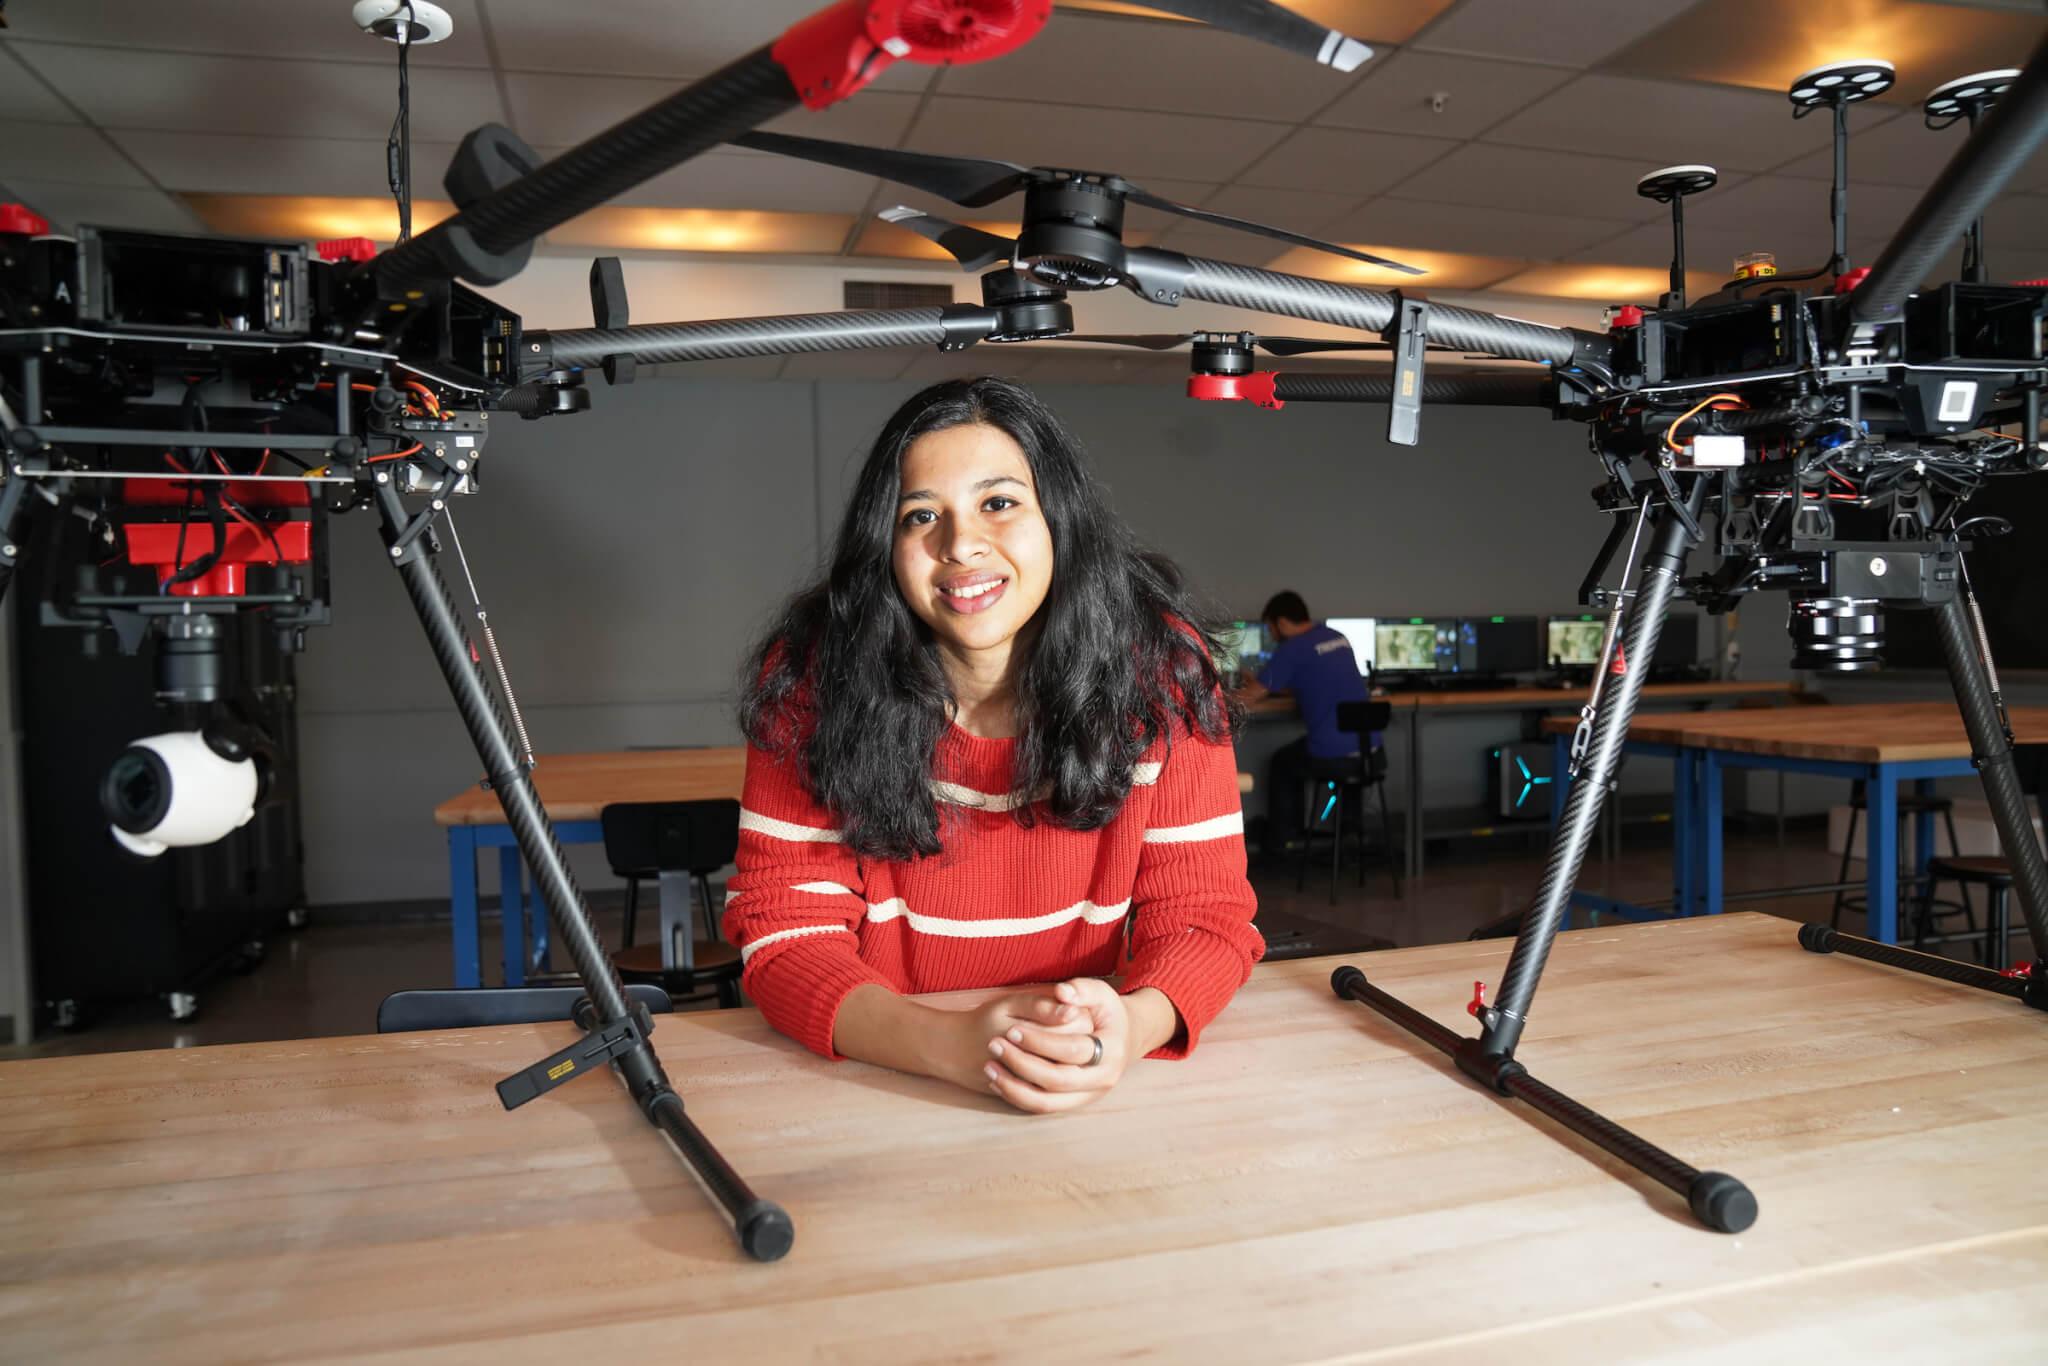 Aishwarya Chandrasekaran with drones